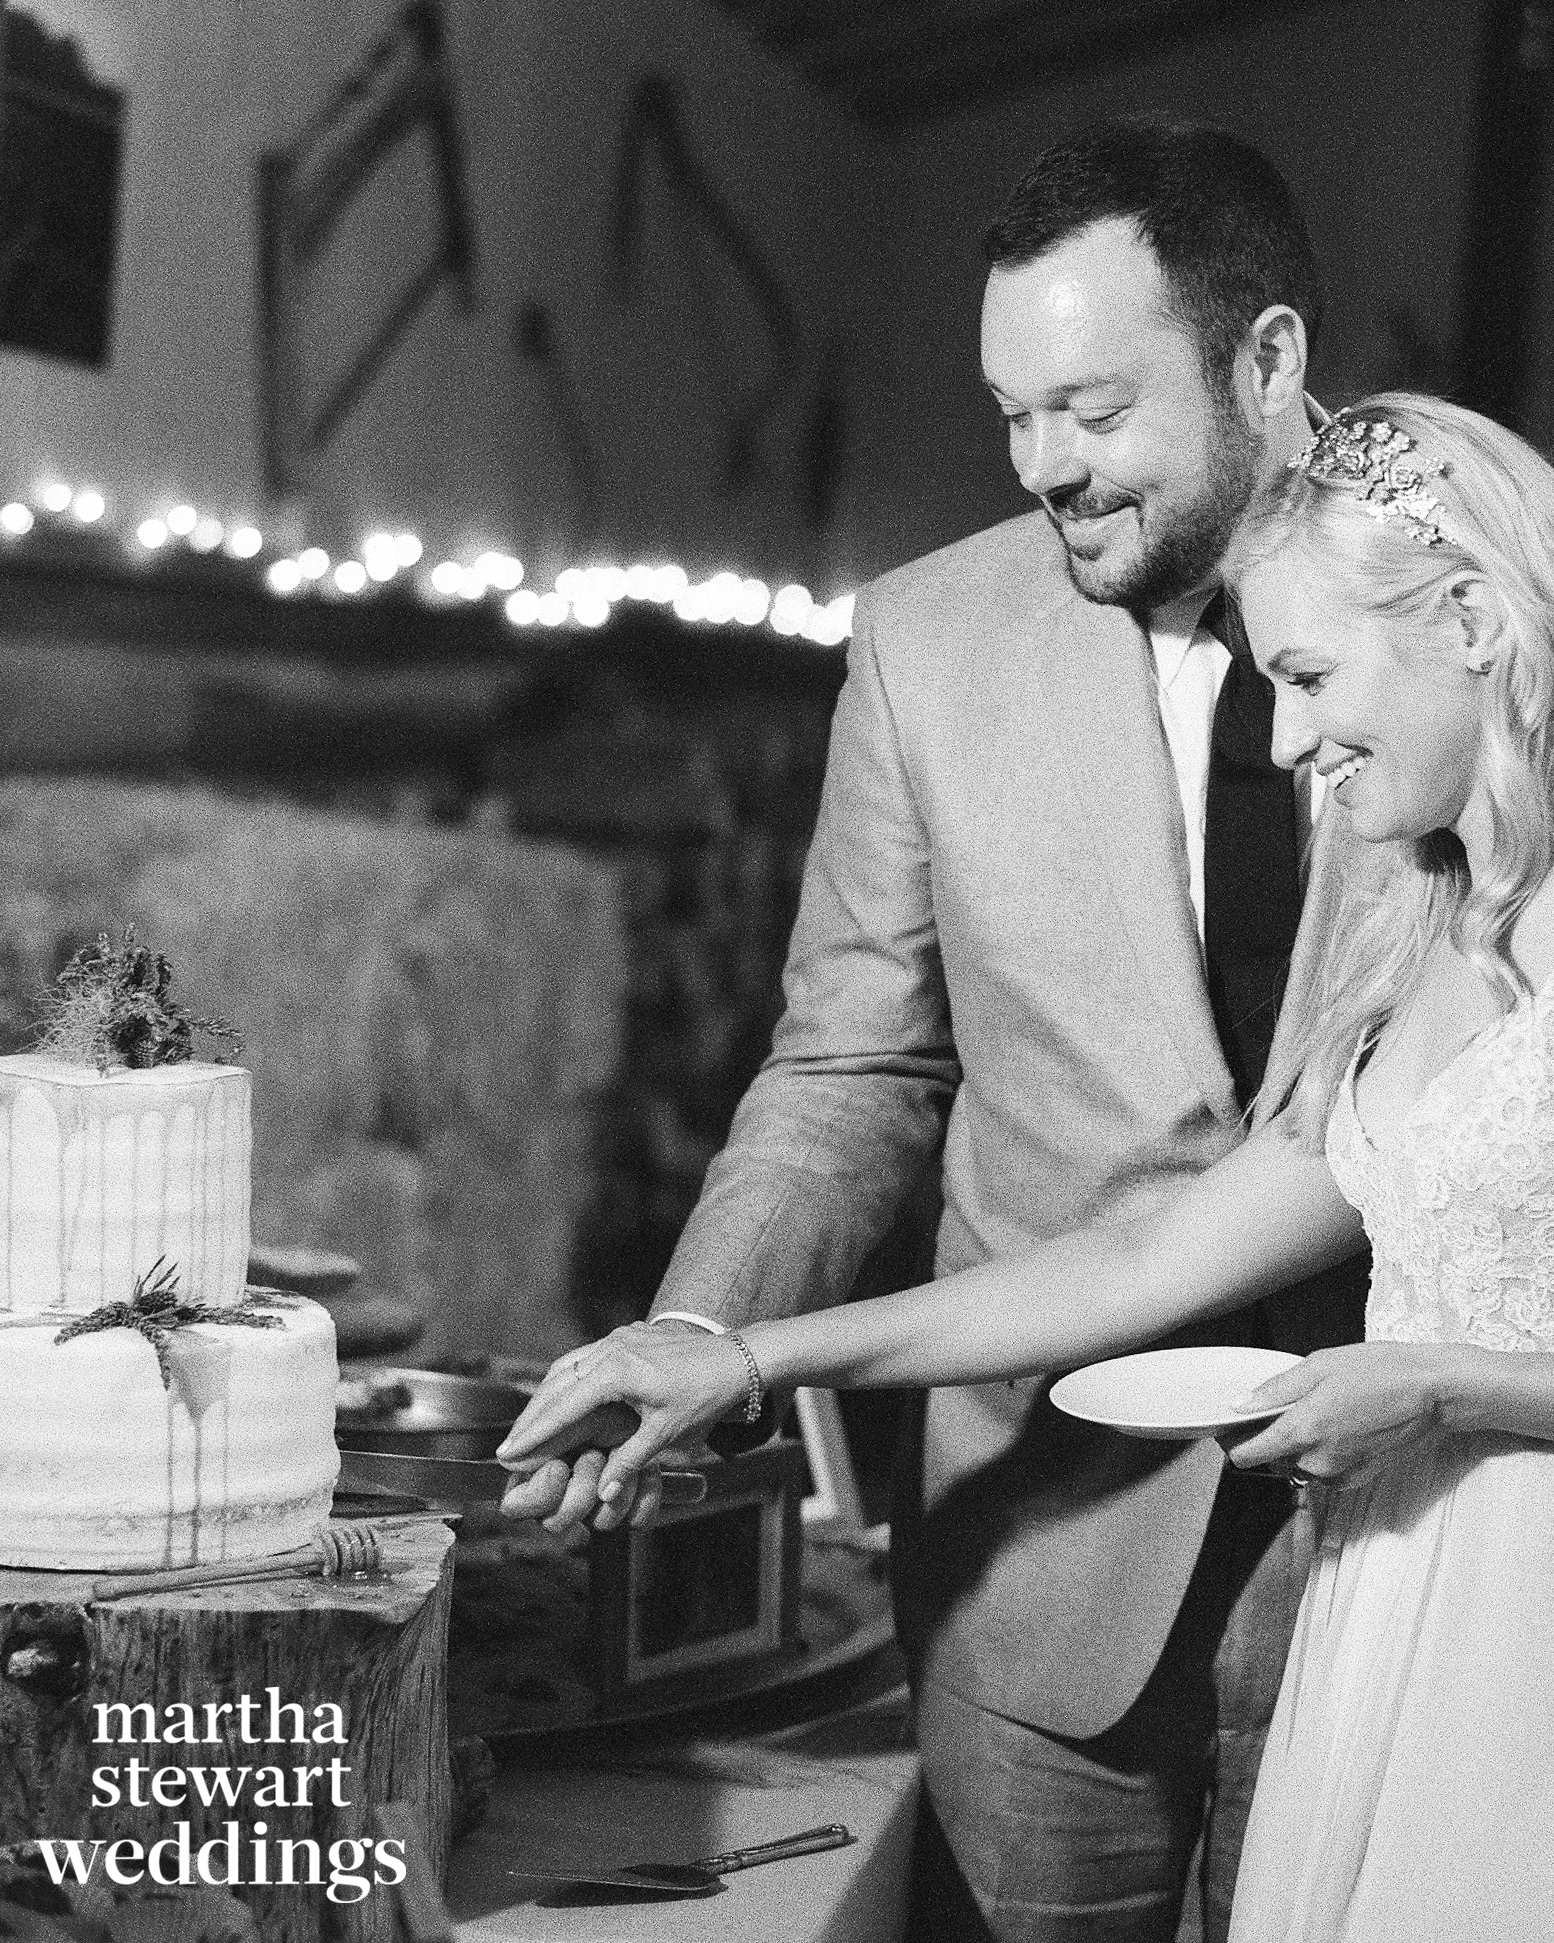 beth behrs michael gladis wedding cake cutting sylvie gil